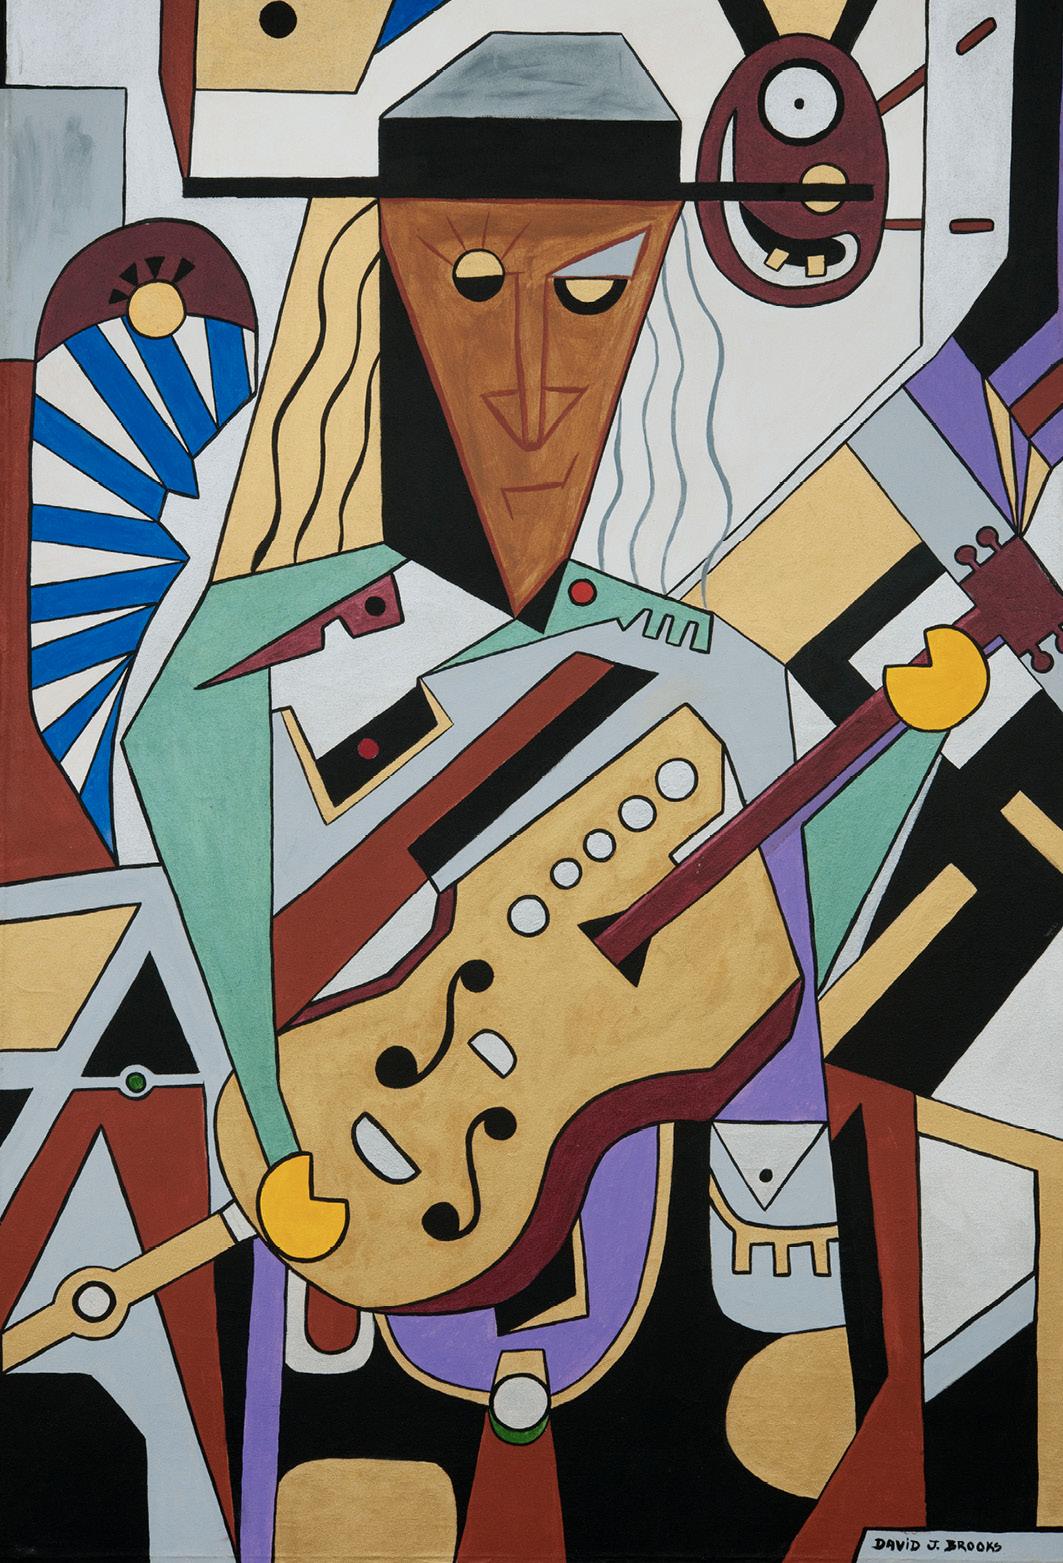 David Brooks: George/Guitar - Indianische Kunst aus Kanada